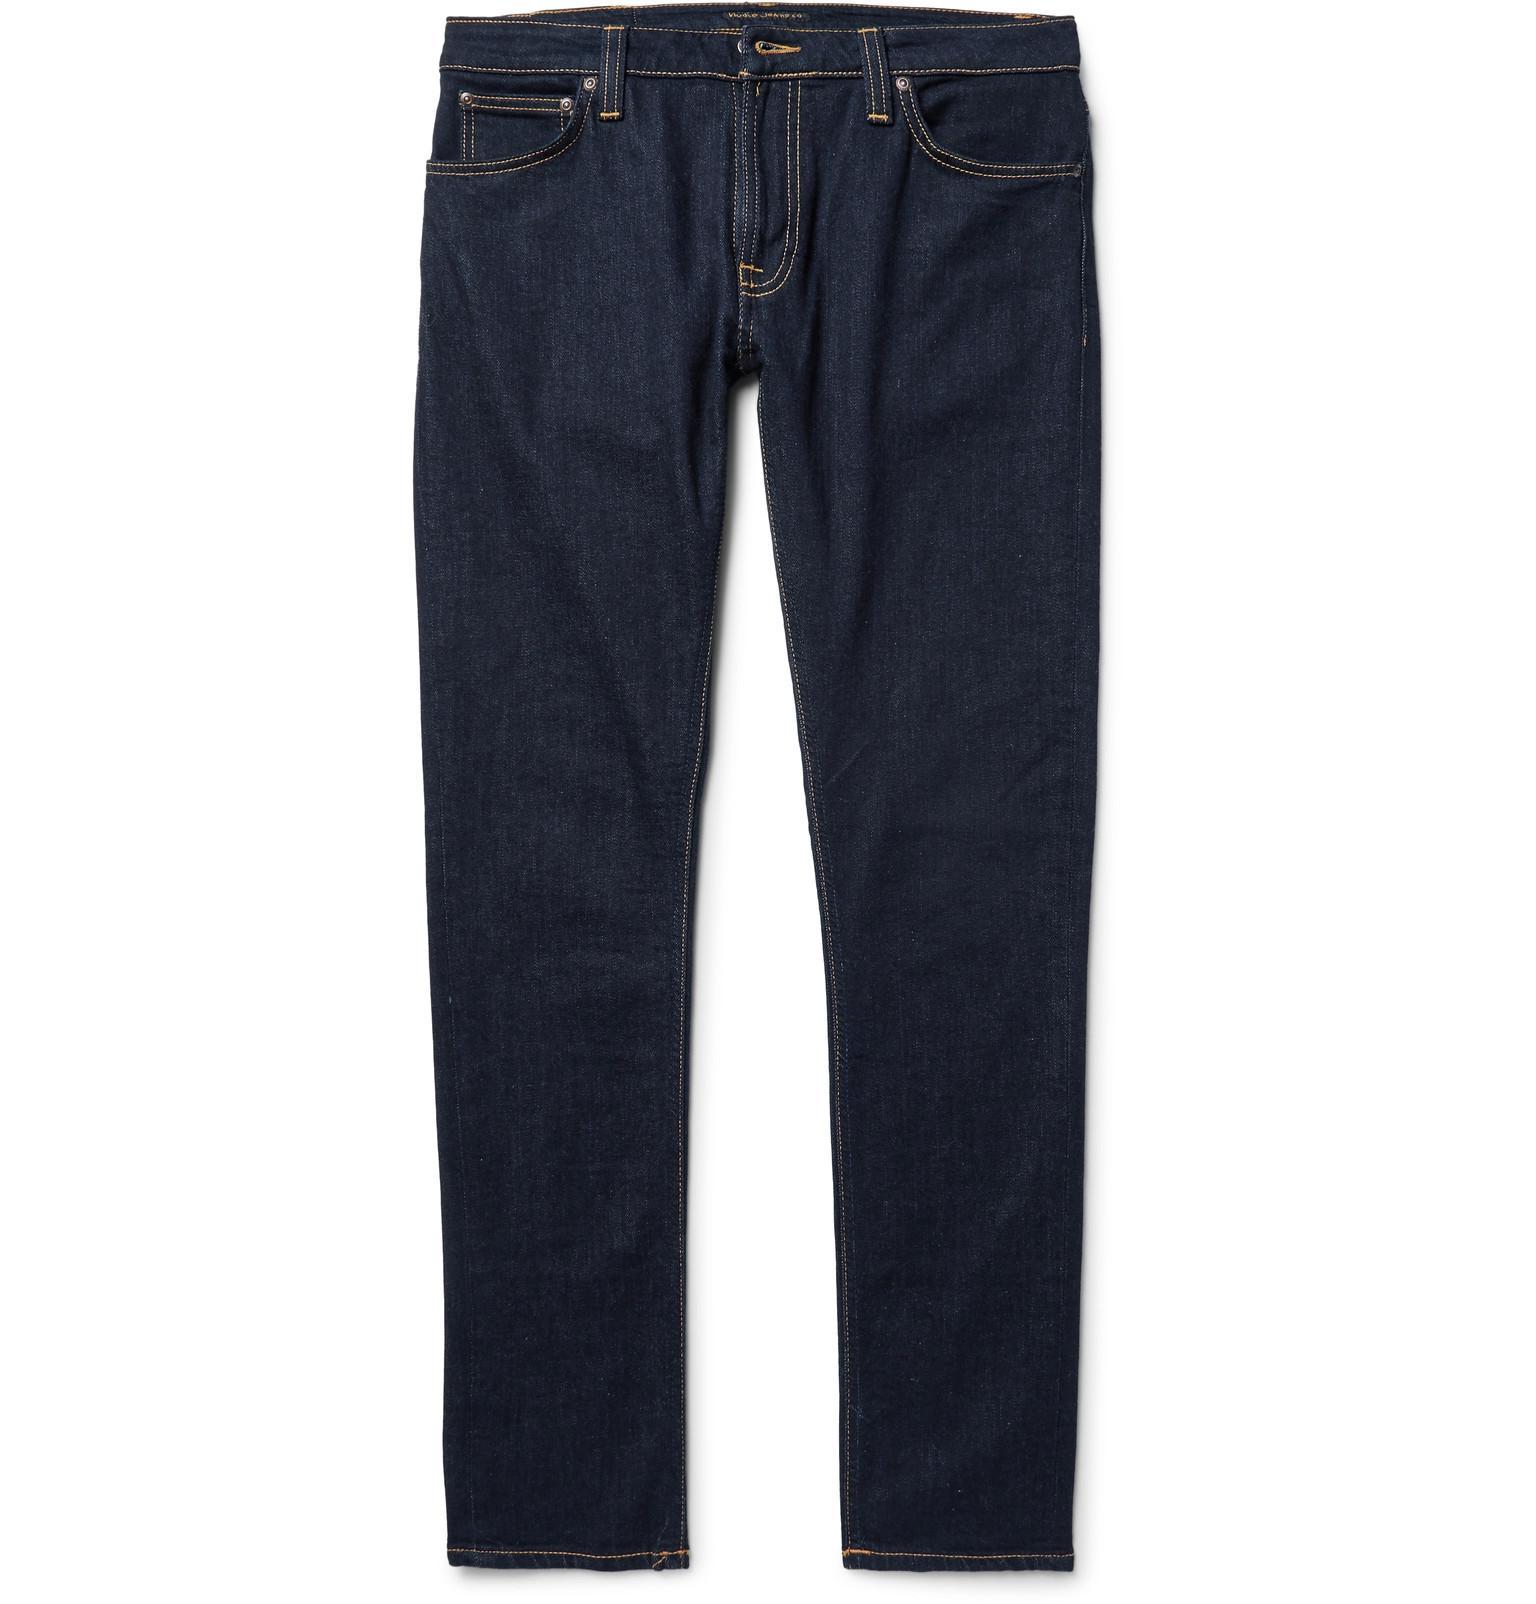 Nudie Lin Skinny Tapered Organic Stretch-denim Jeans - Blue Jeu Acheter Obtenir À La Mode Acheter Pas Cher En Ligne yUhJ7P6Qht